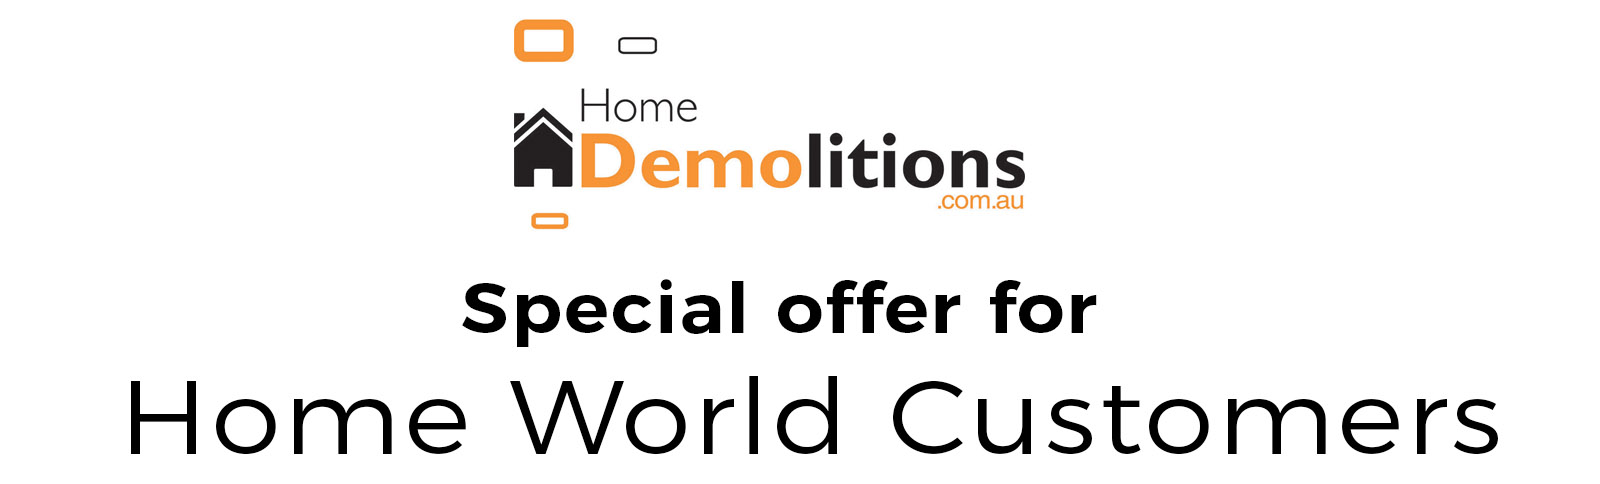 special offer for home world .jpg